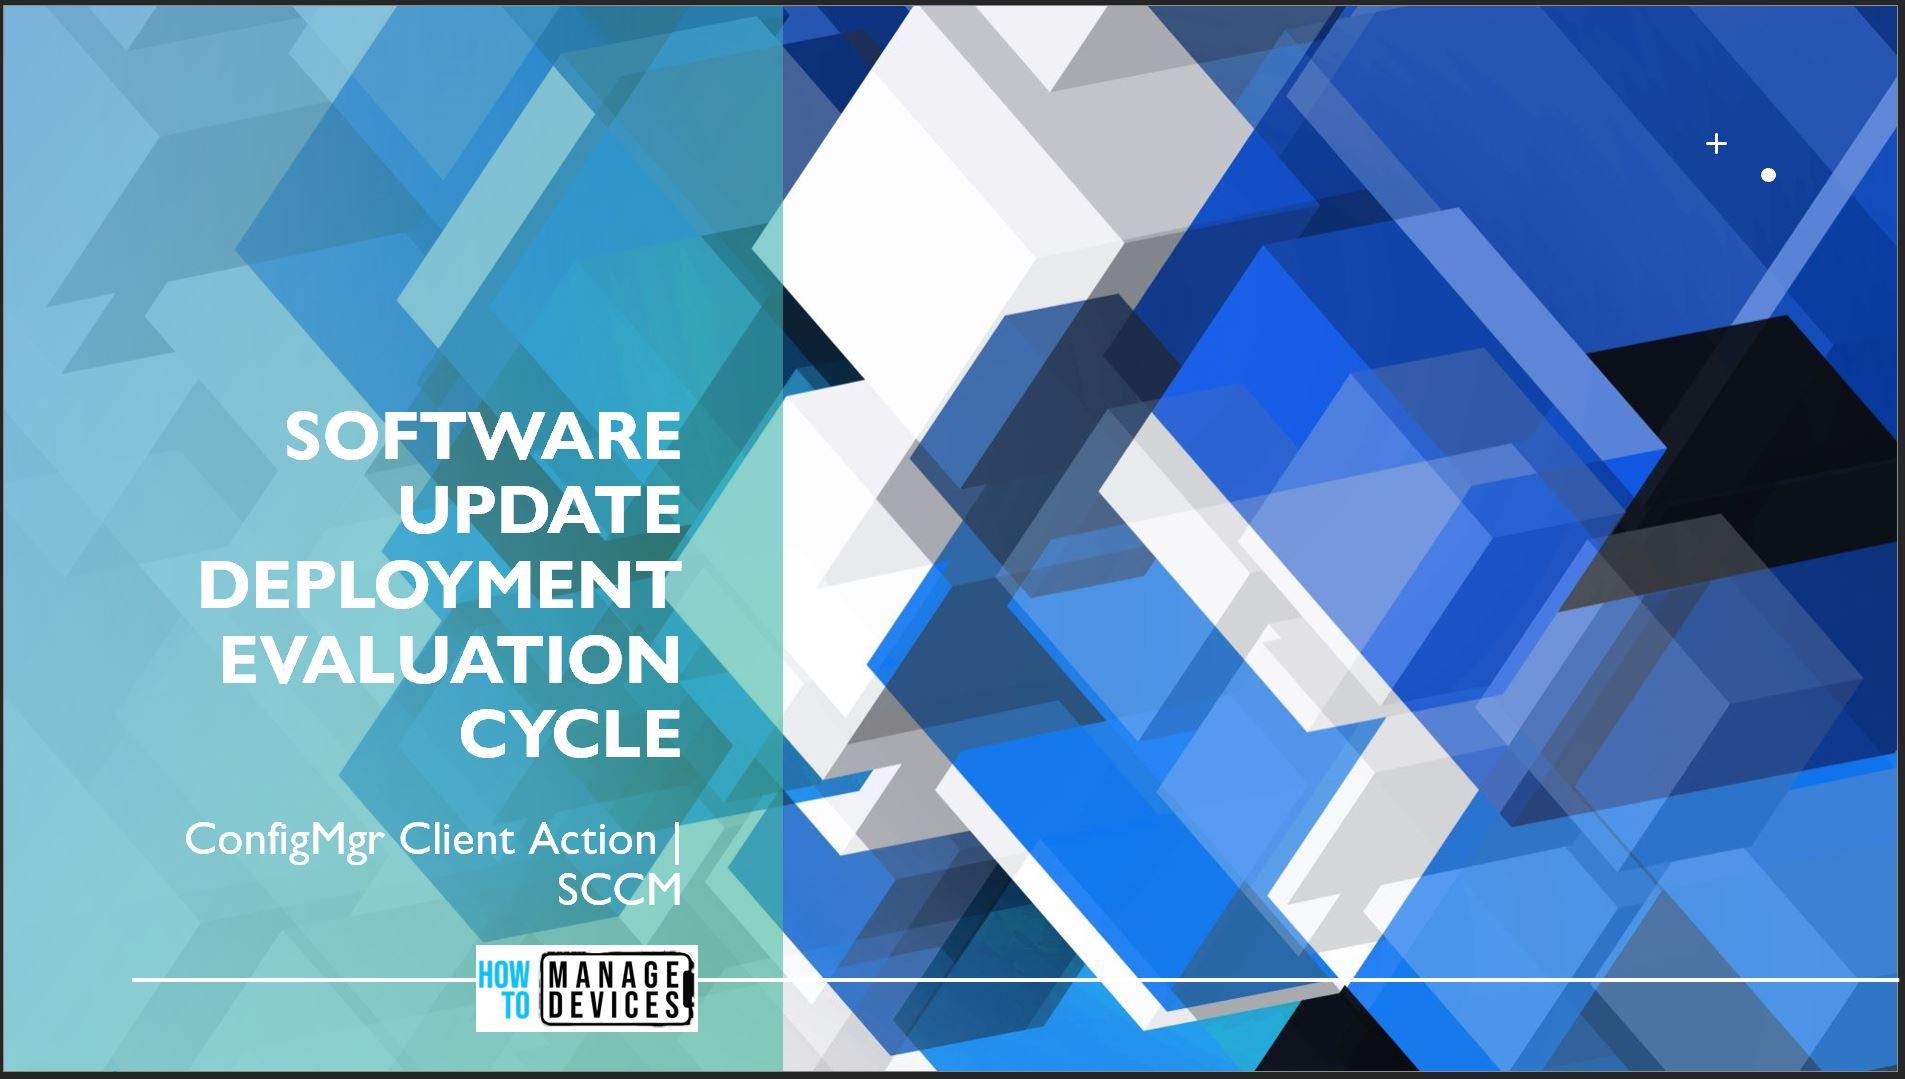 Software Update Deployment